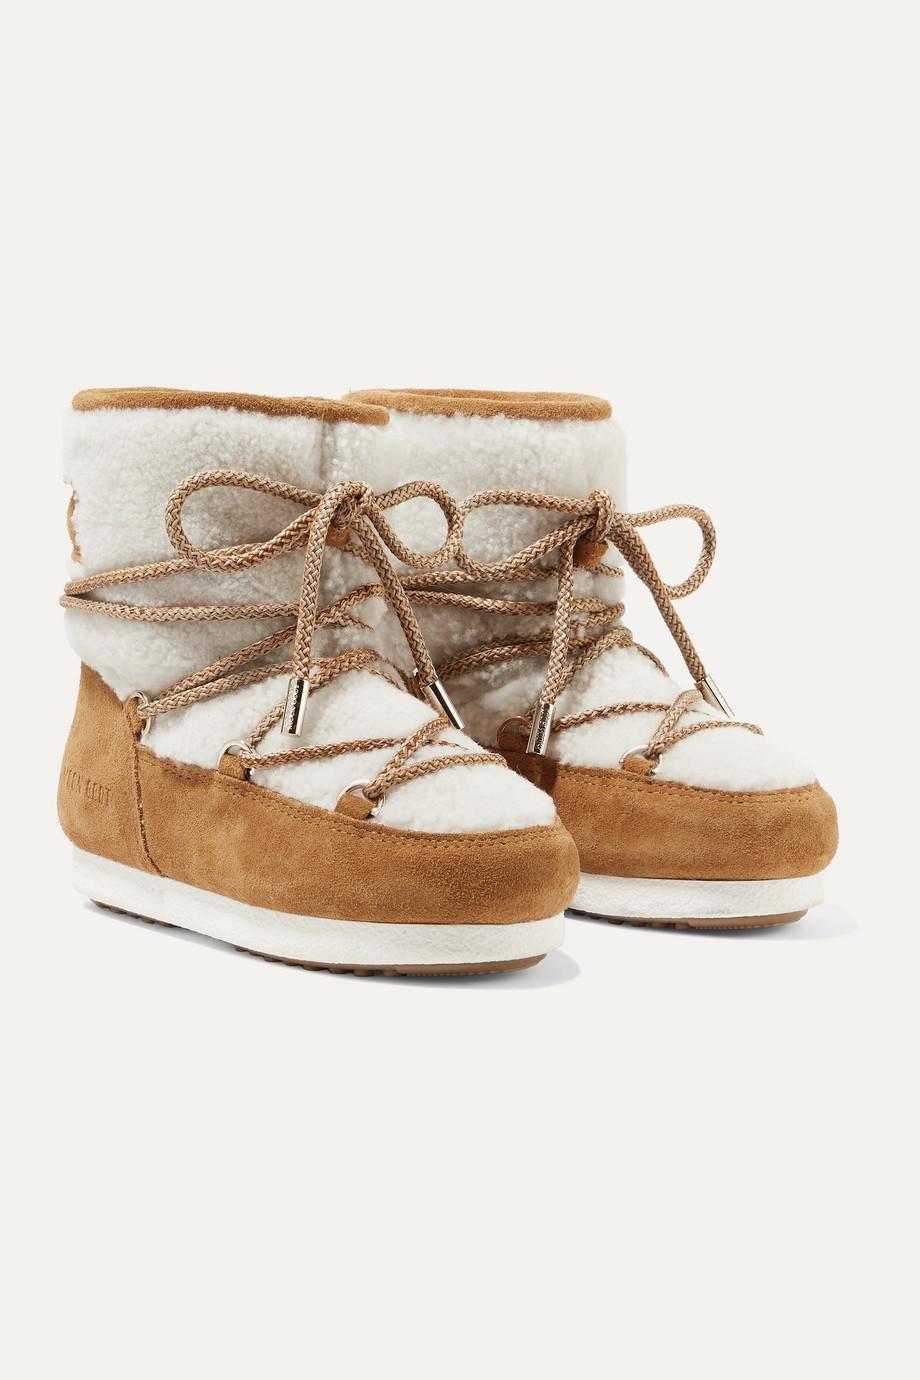 Moon Boot Kids 【 4 - 11 岁】羊毛皮绒面革雪地靴